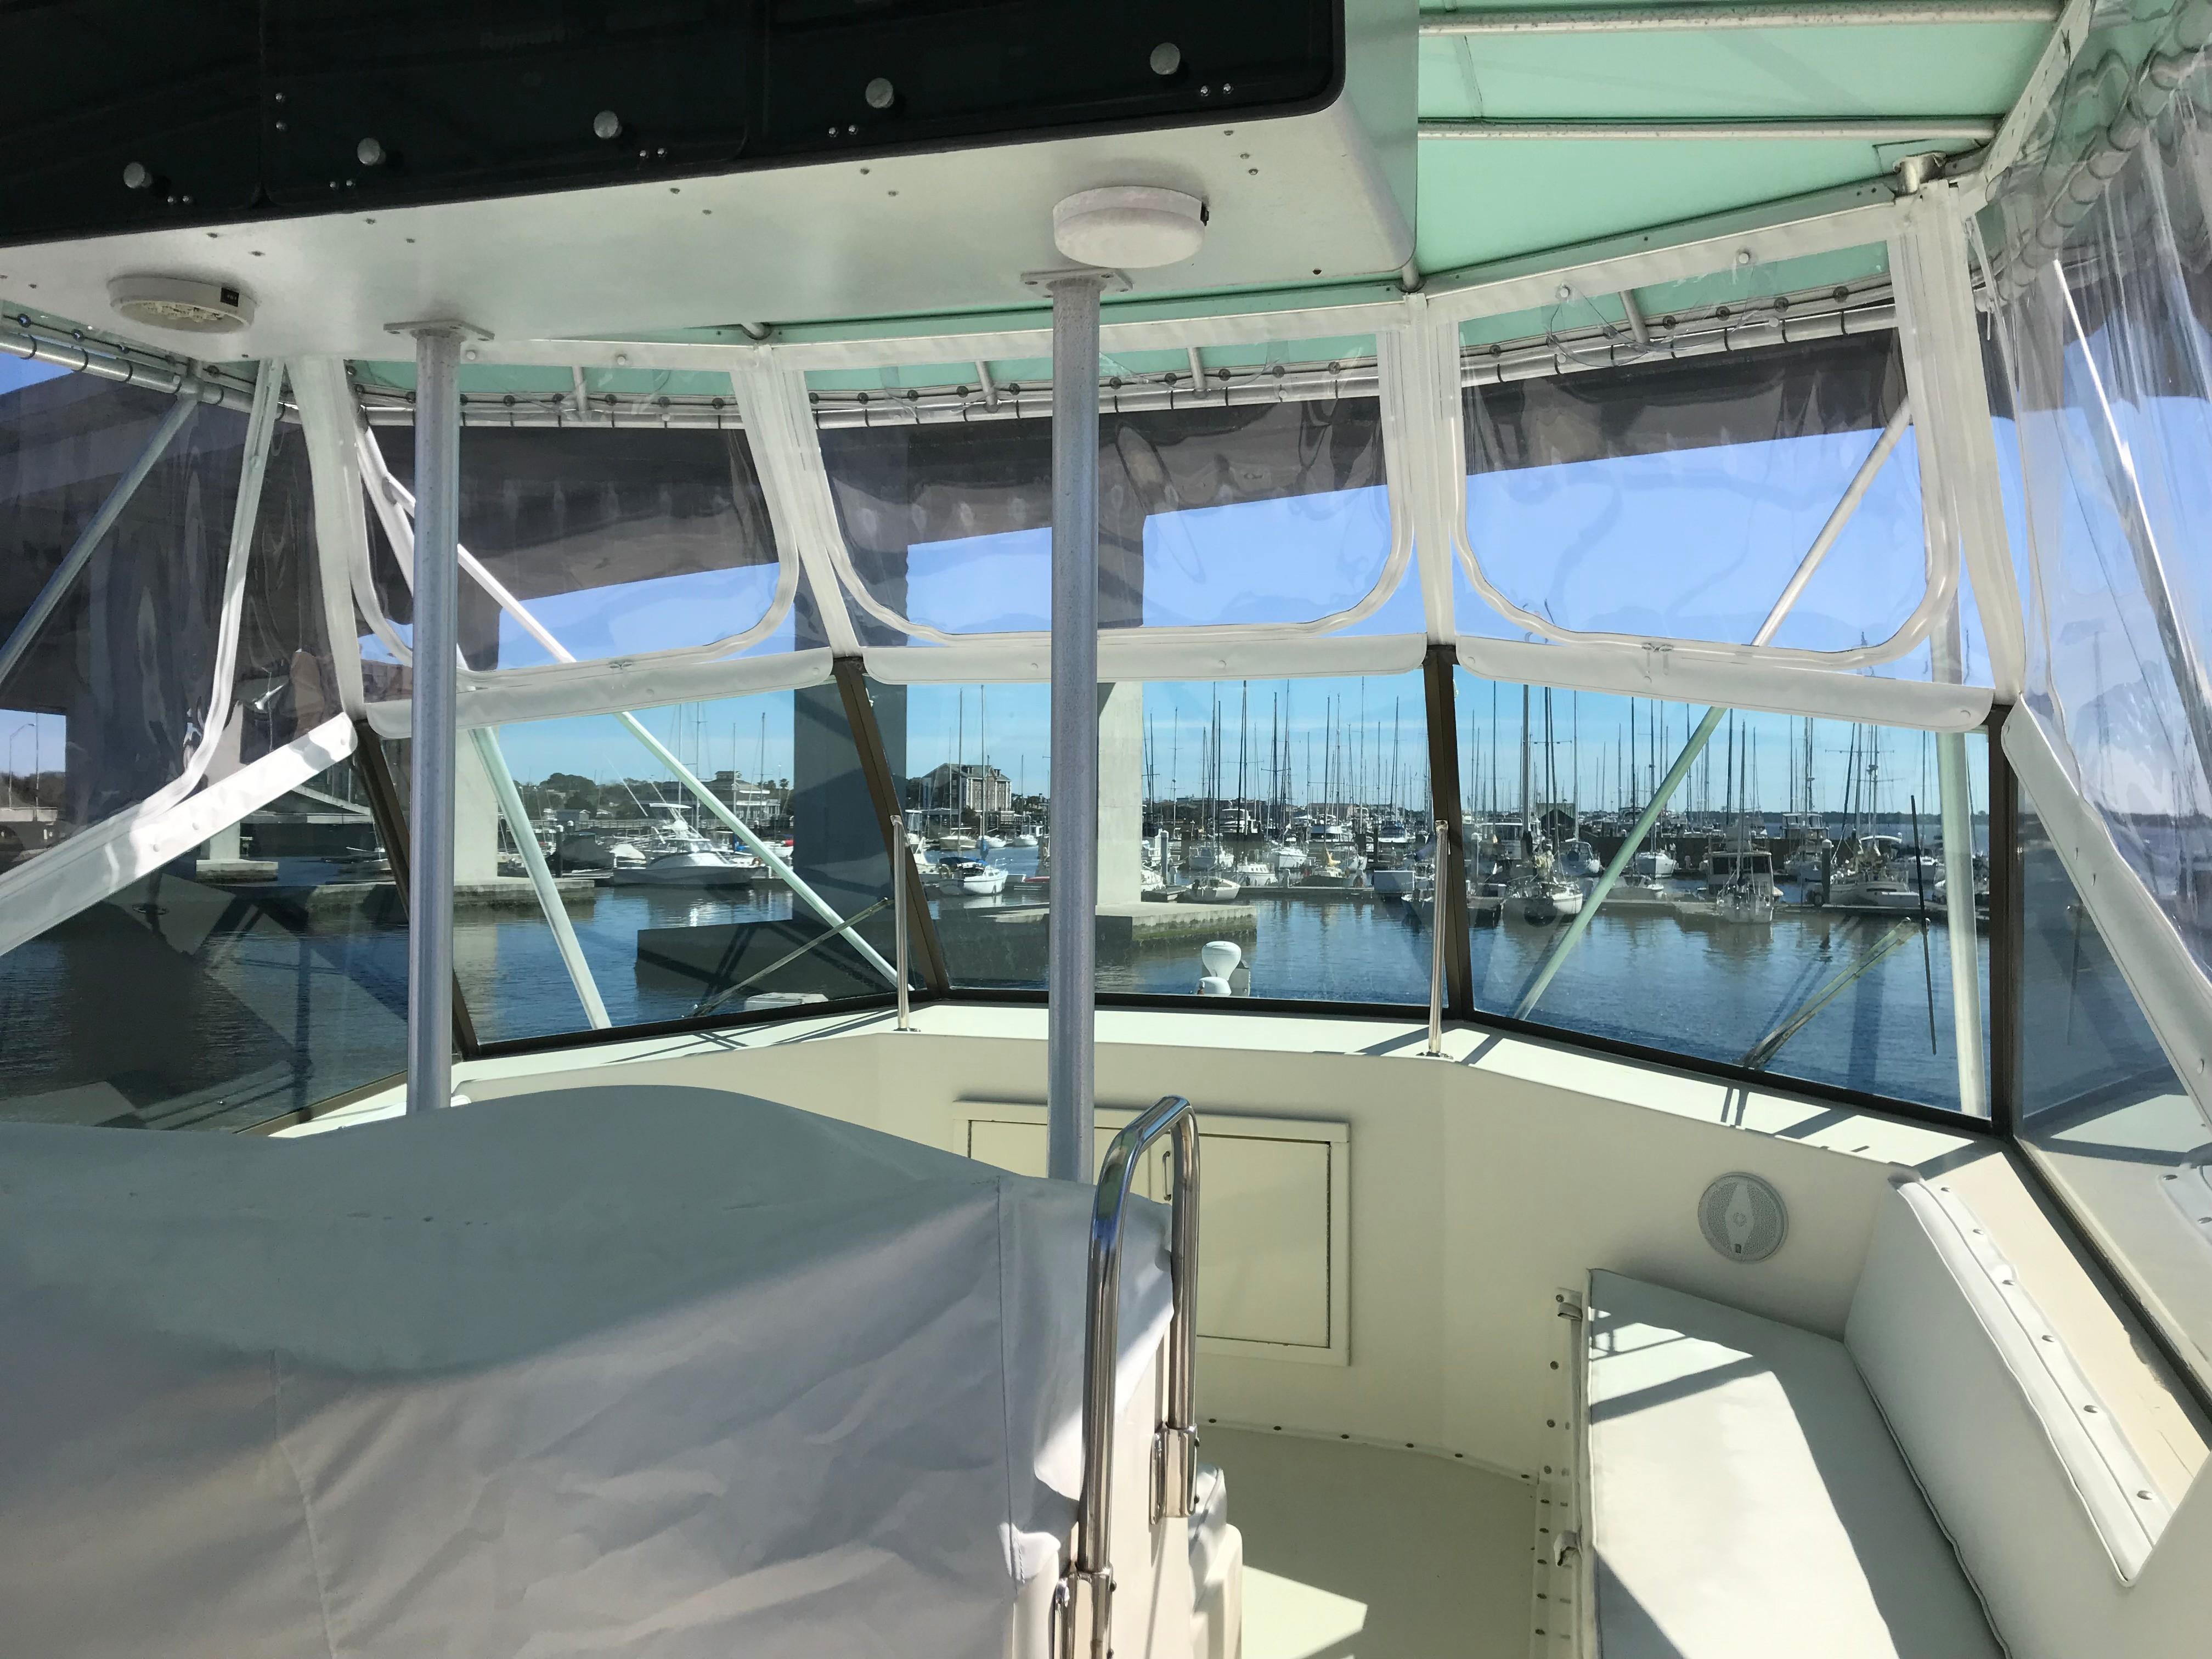 Hatteras Convertible - MUST SEE - Flybridge forward